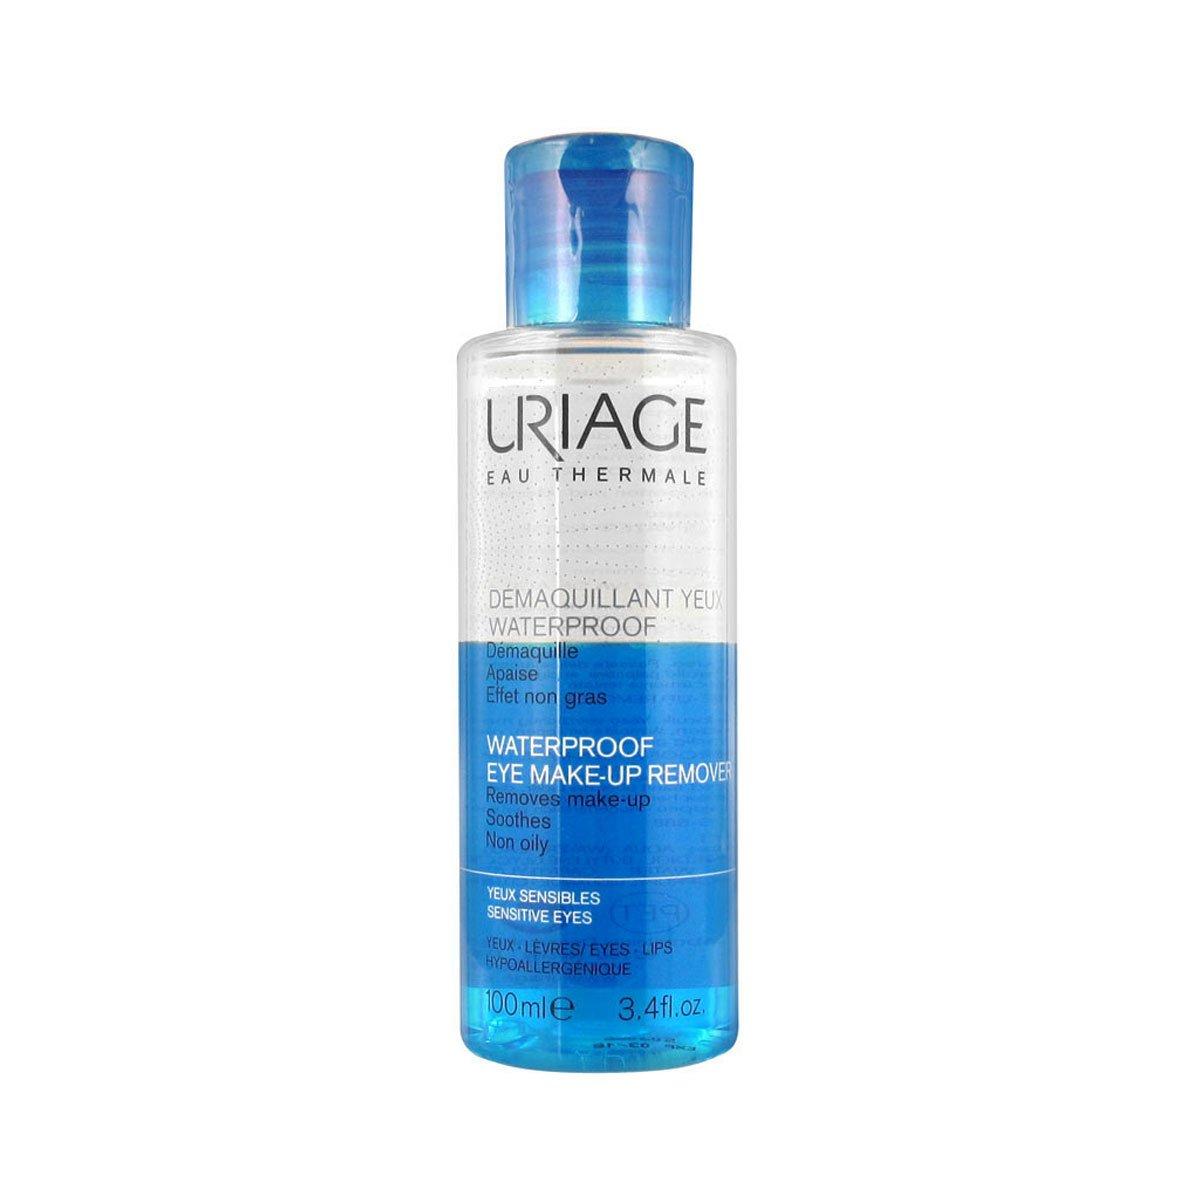 Uriage Waterproof Eye Make-up Remover 100ml 28159